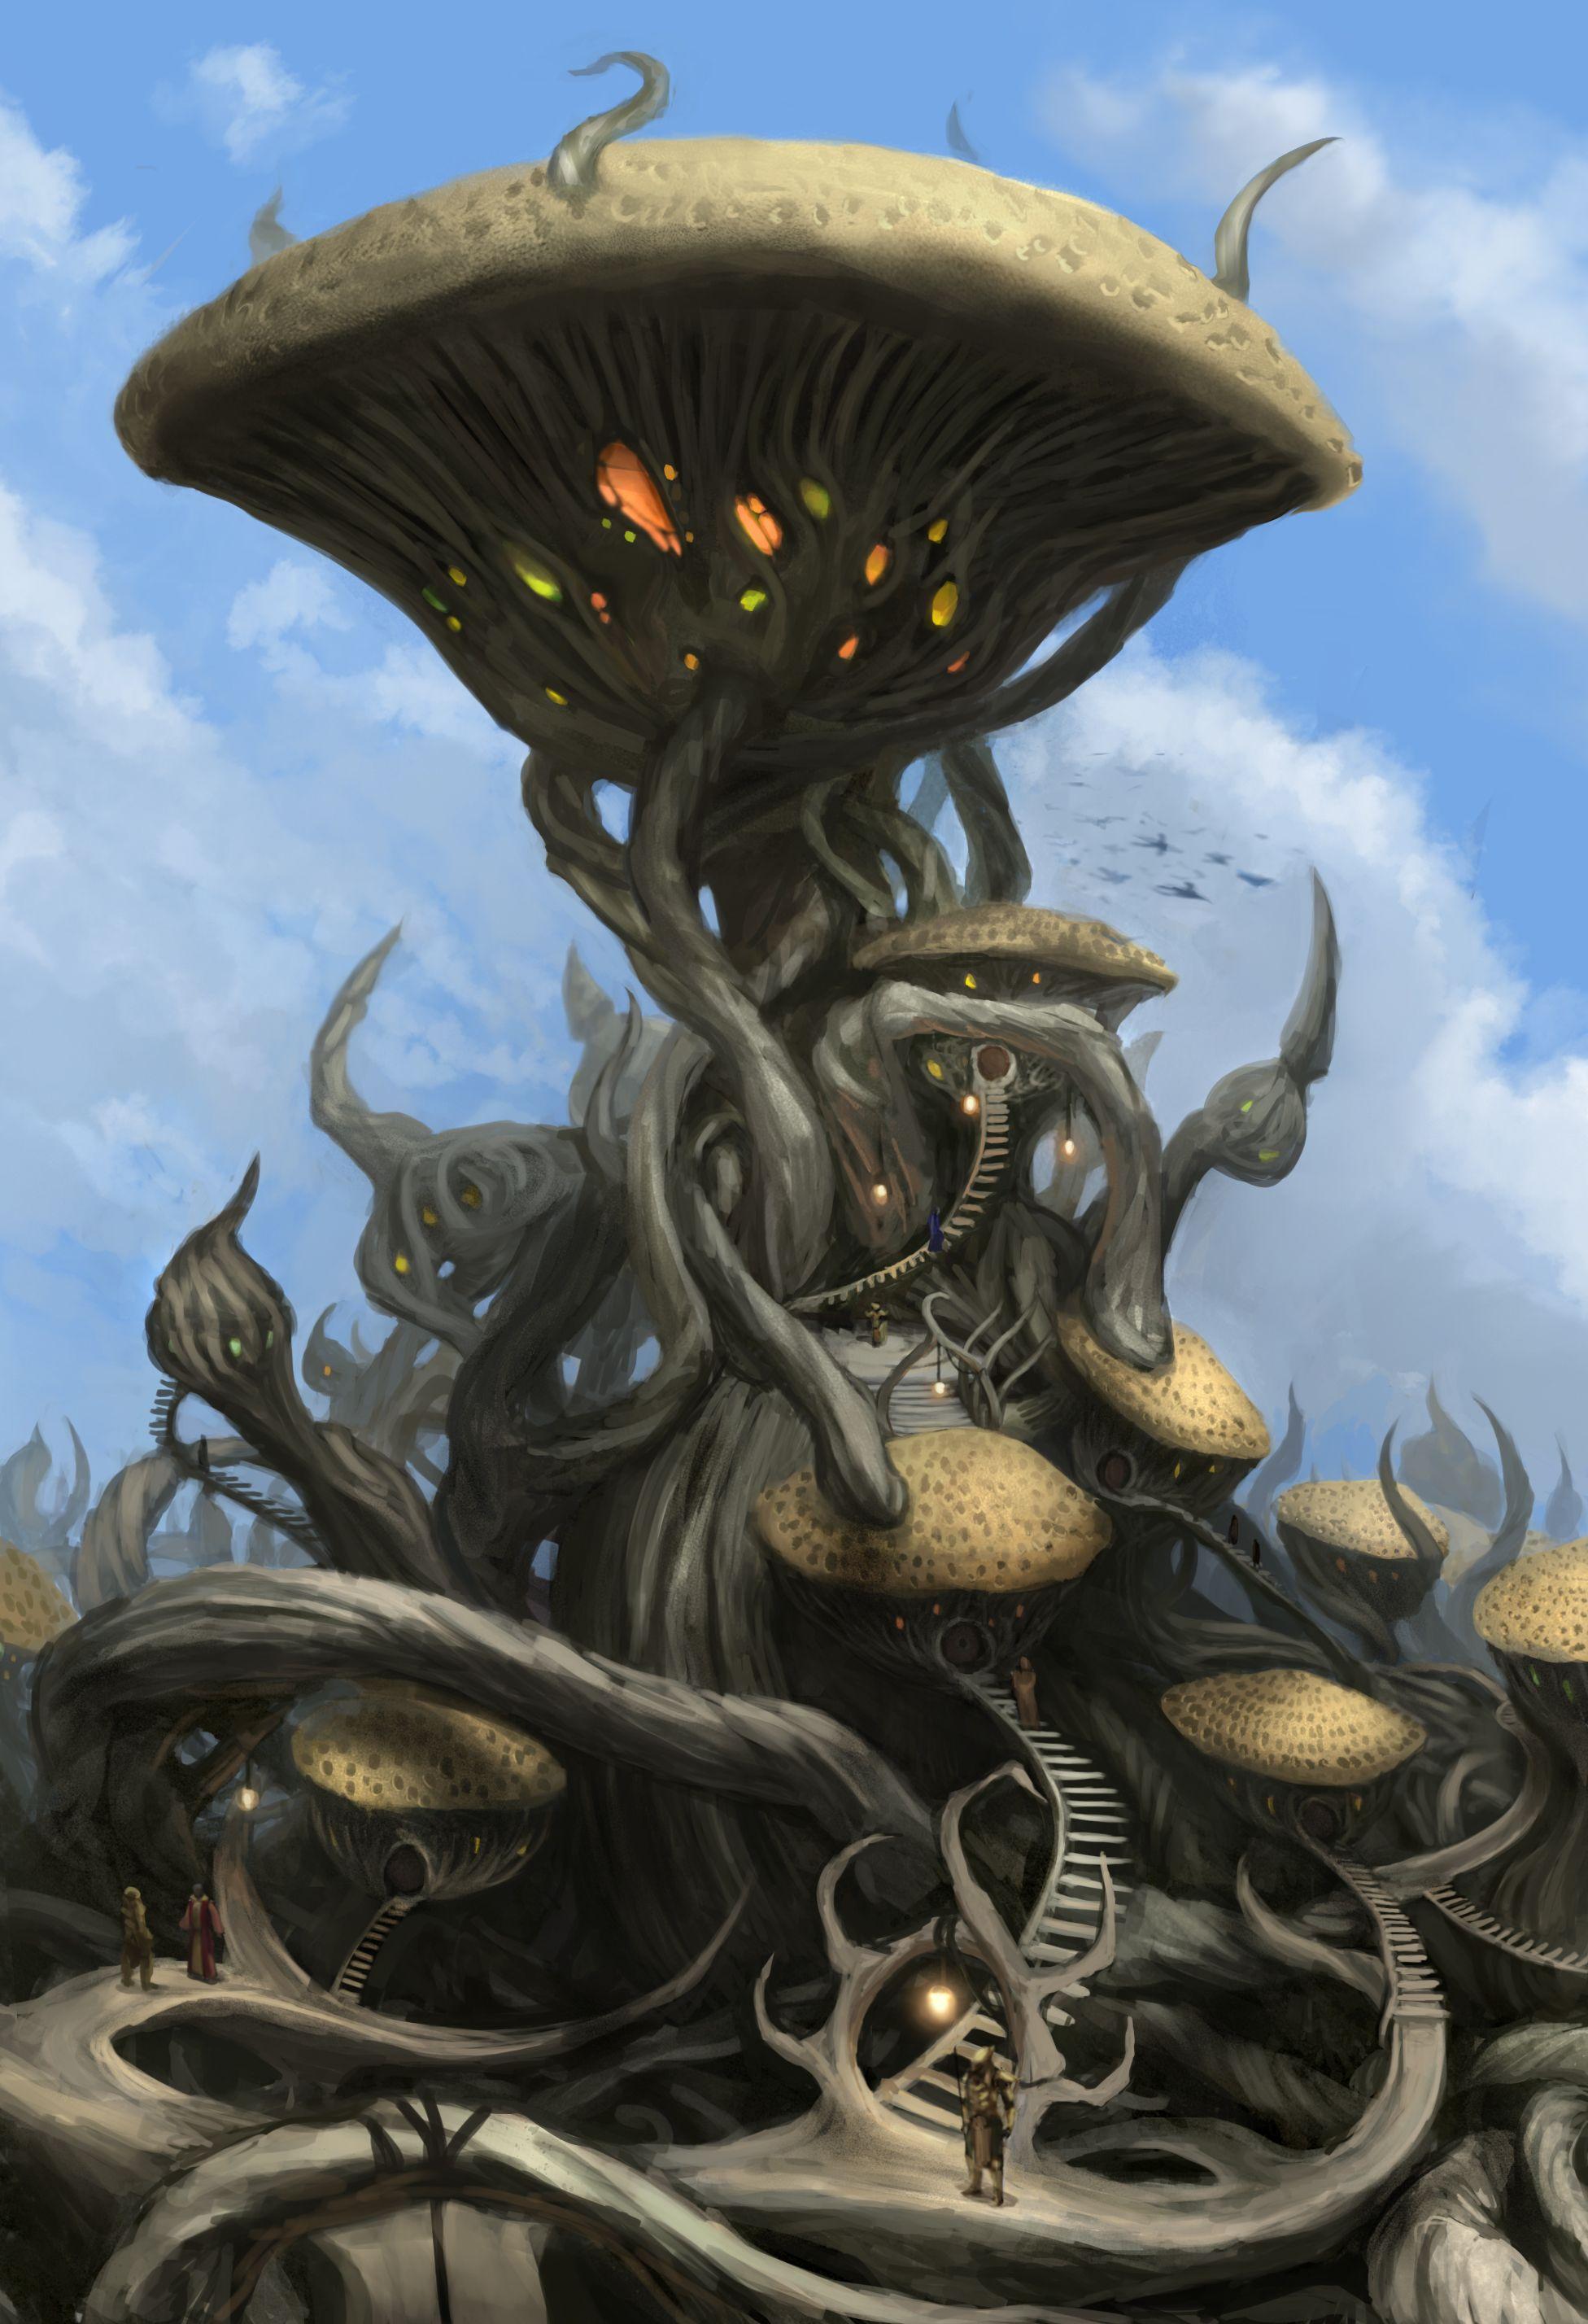 Tel Naga Elder Scrolls Art Elder Scrolls Morrowind Elder Scrolls Skyrim